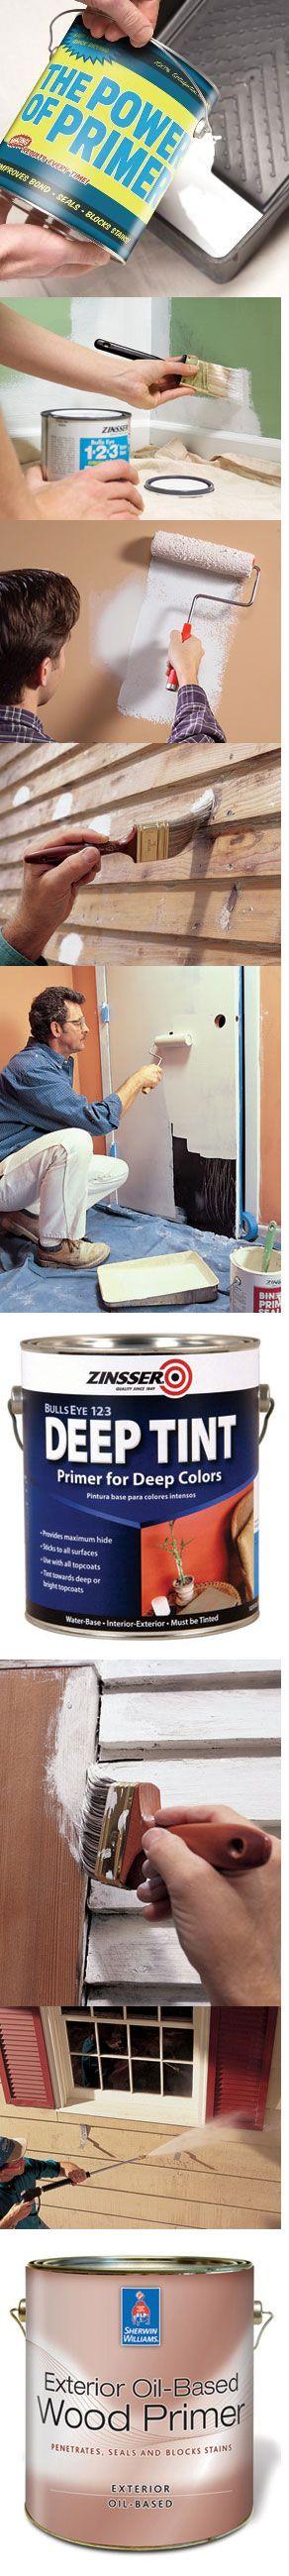 solver paint vitesse coloring pages - photo#28